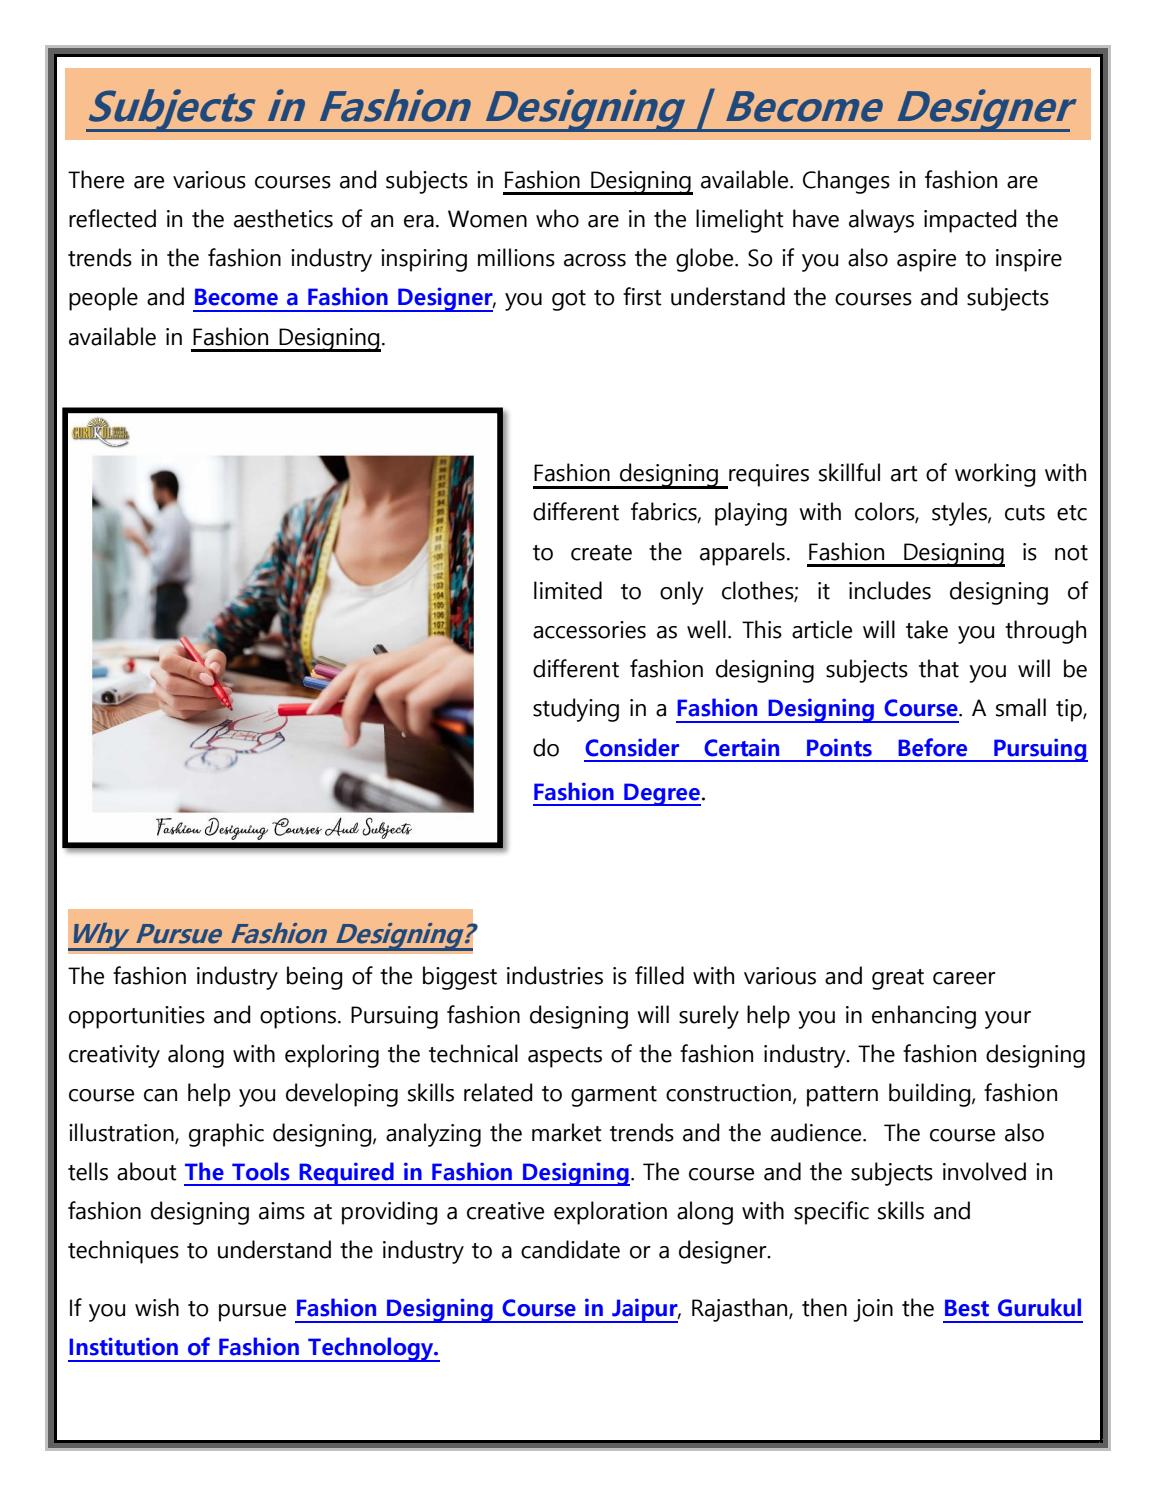 Subjects In Fashion Designing Become Fashion Designer By Gurukulintitution Issuu